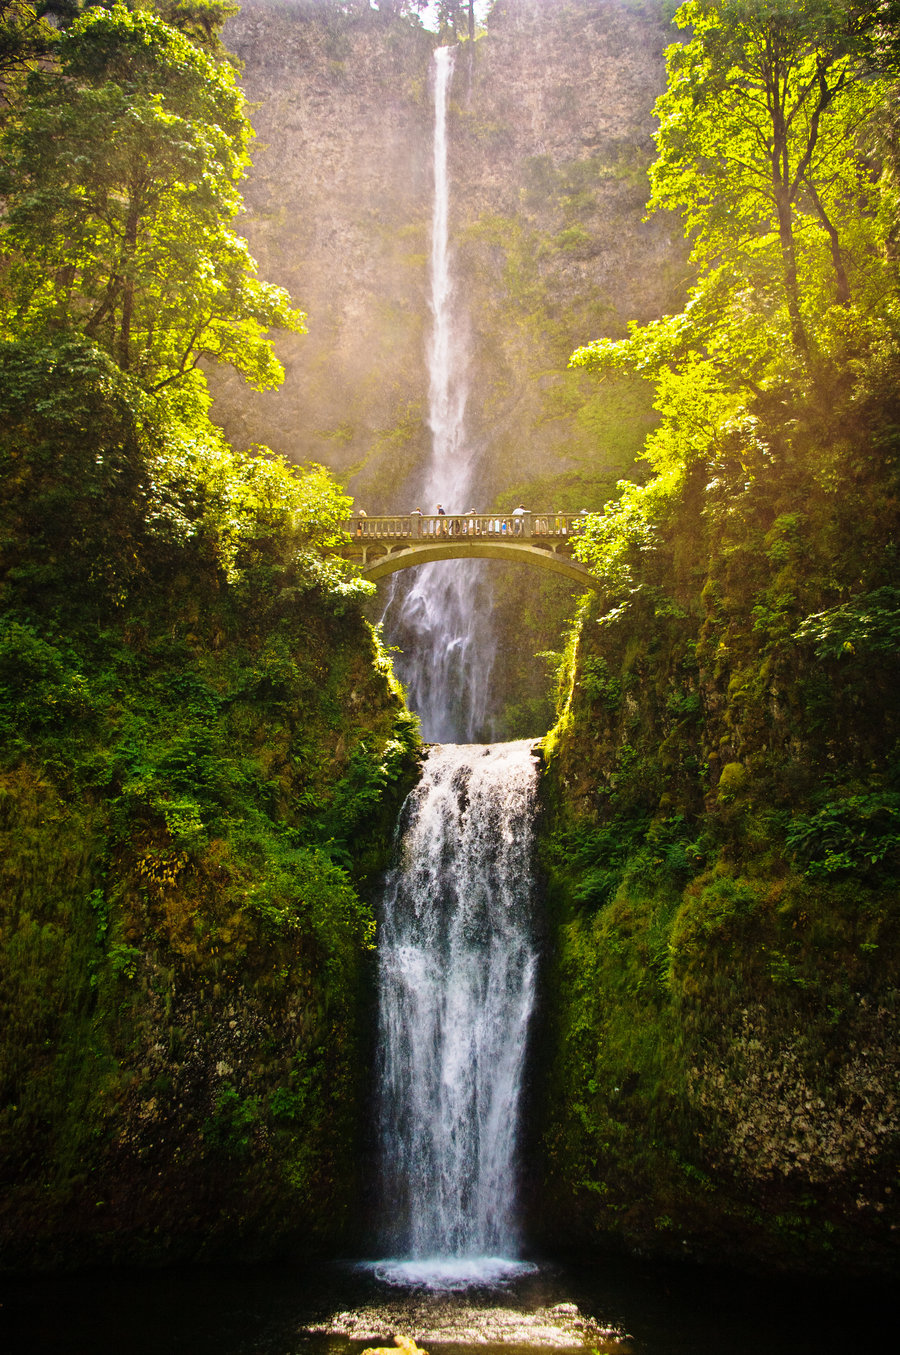 Multnomah Falls Oregon Wallpaper Here We Go Roalt2013